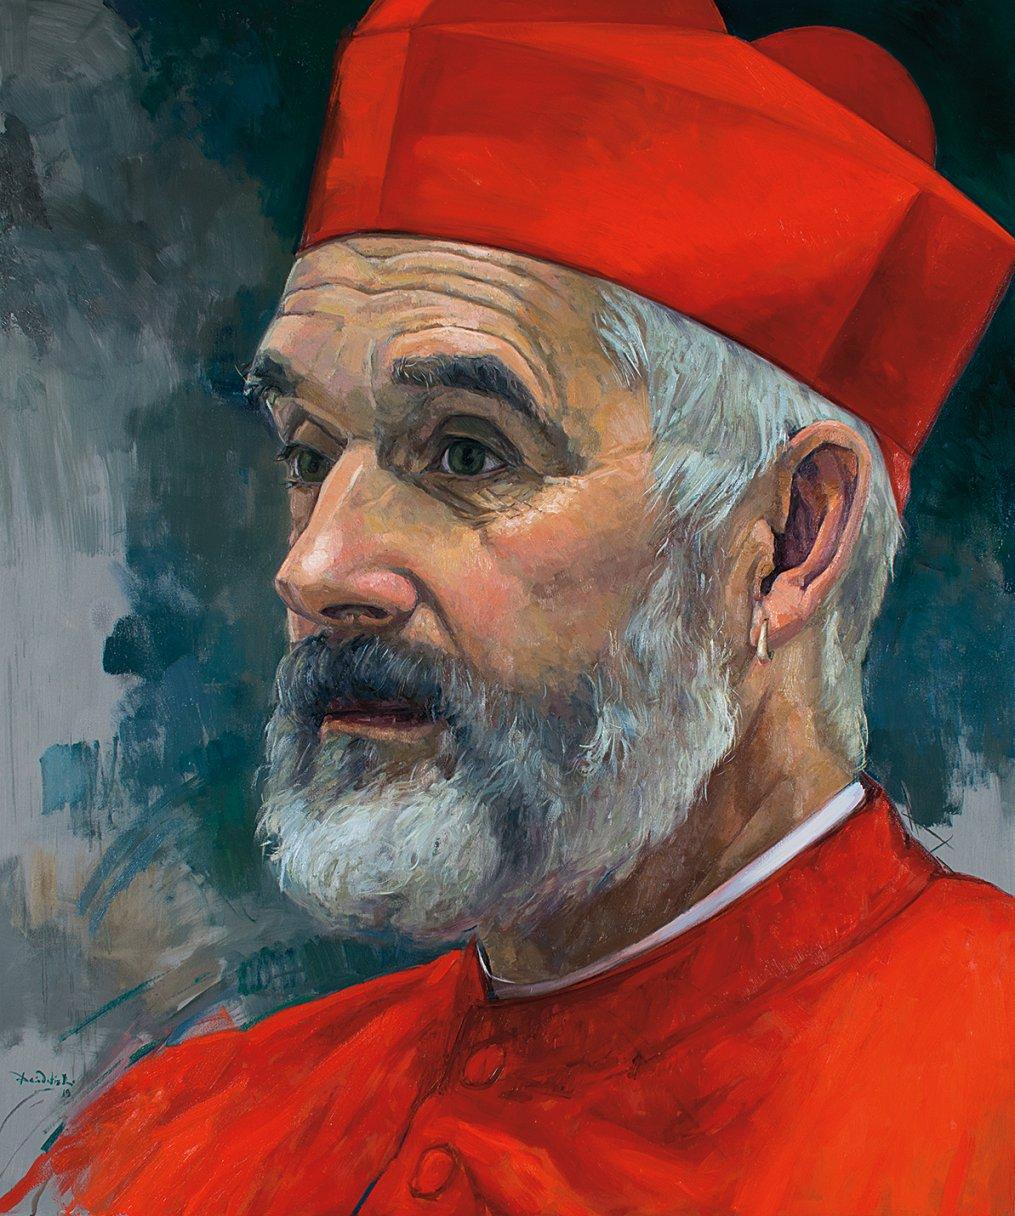 Cardenal (2018) - Darío Ortiz Robledo